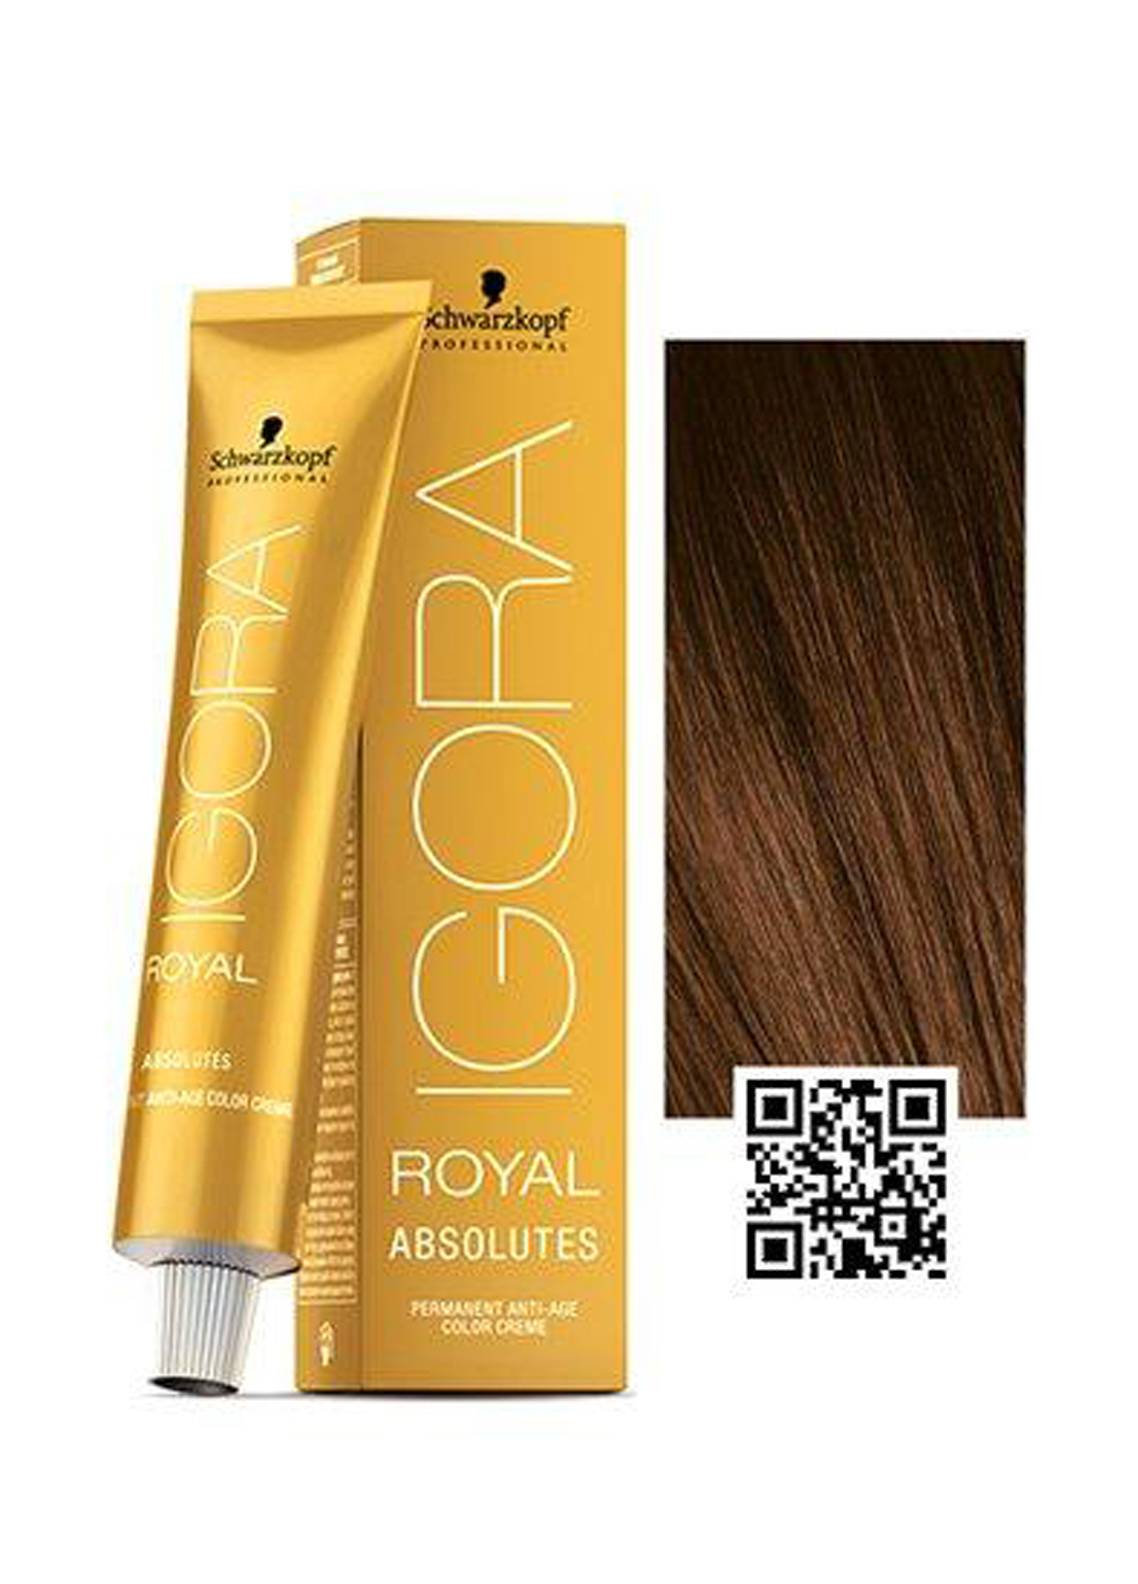 Schwarzkopf Igora Royal Absolutes Hair Color - Light Brown Gold Natural 5-50